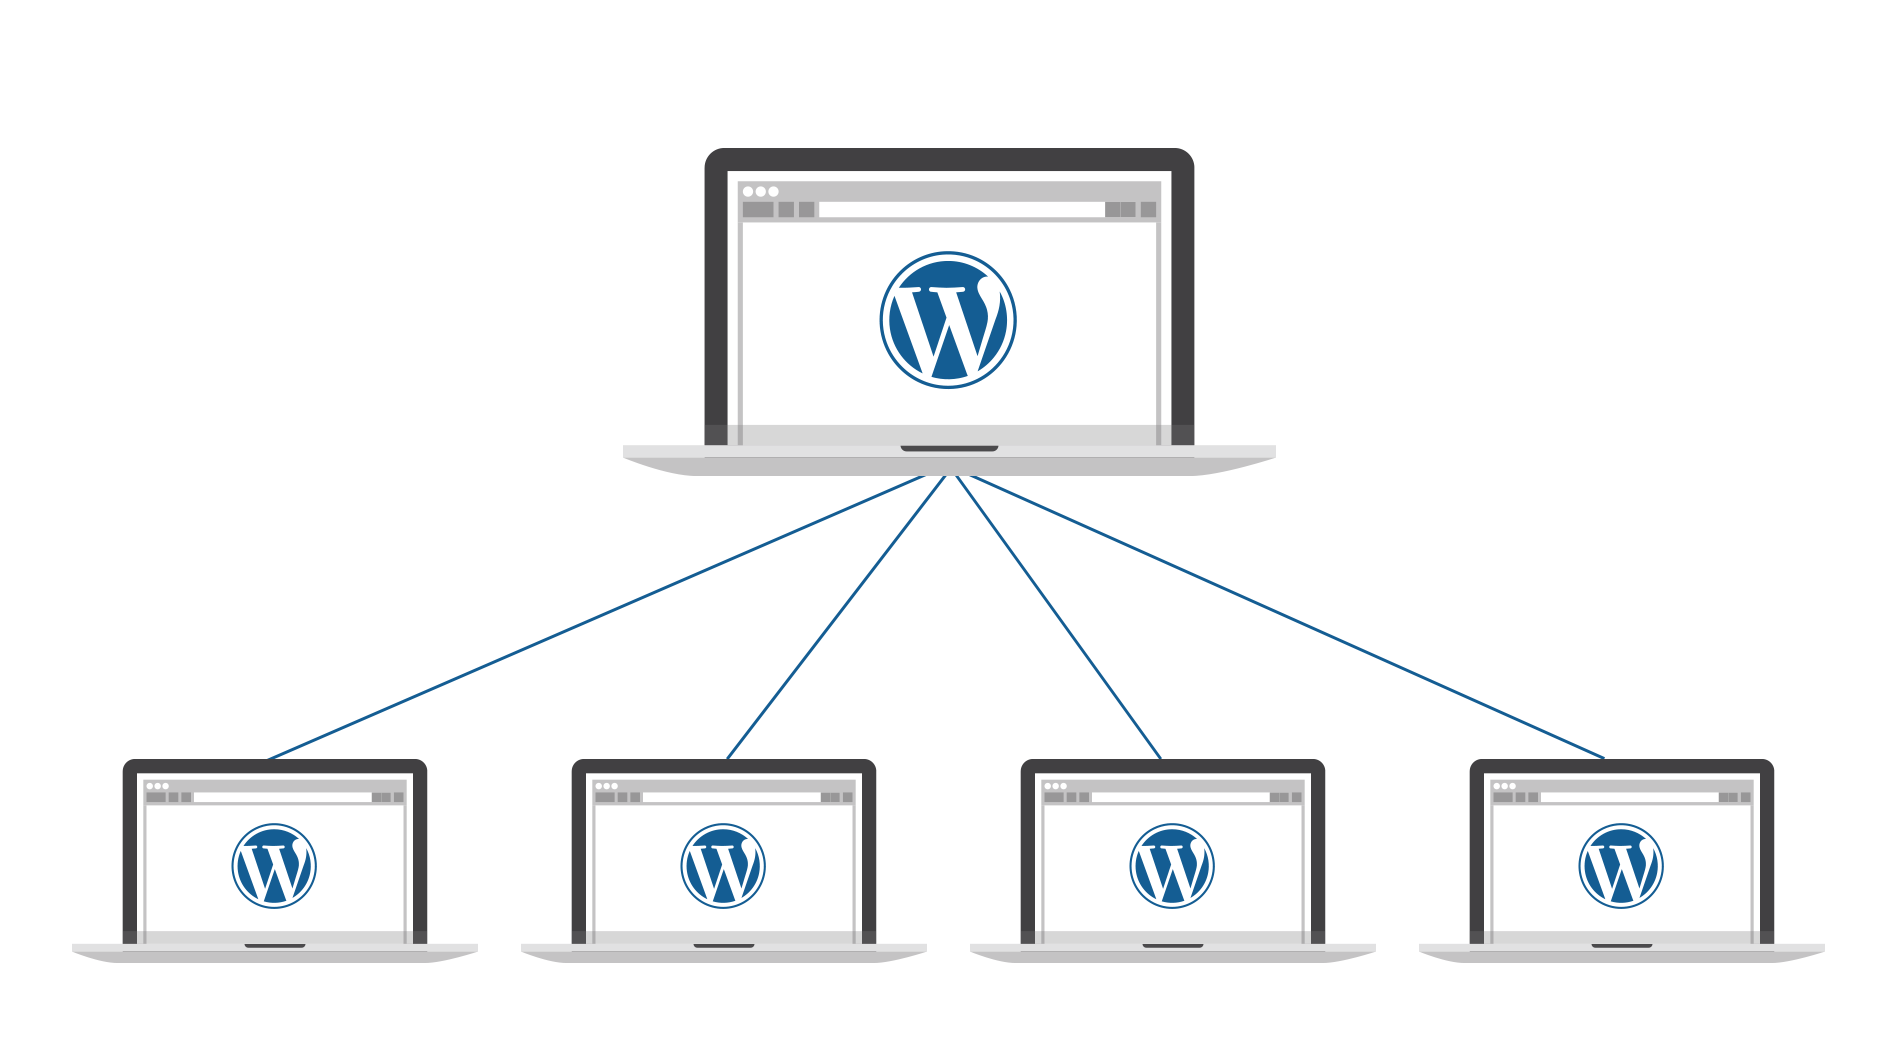 Visualization of a Wordpress Multisite Setup